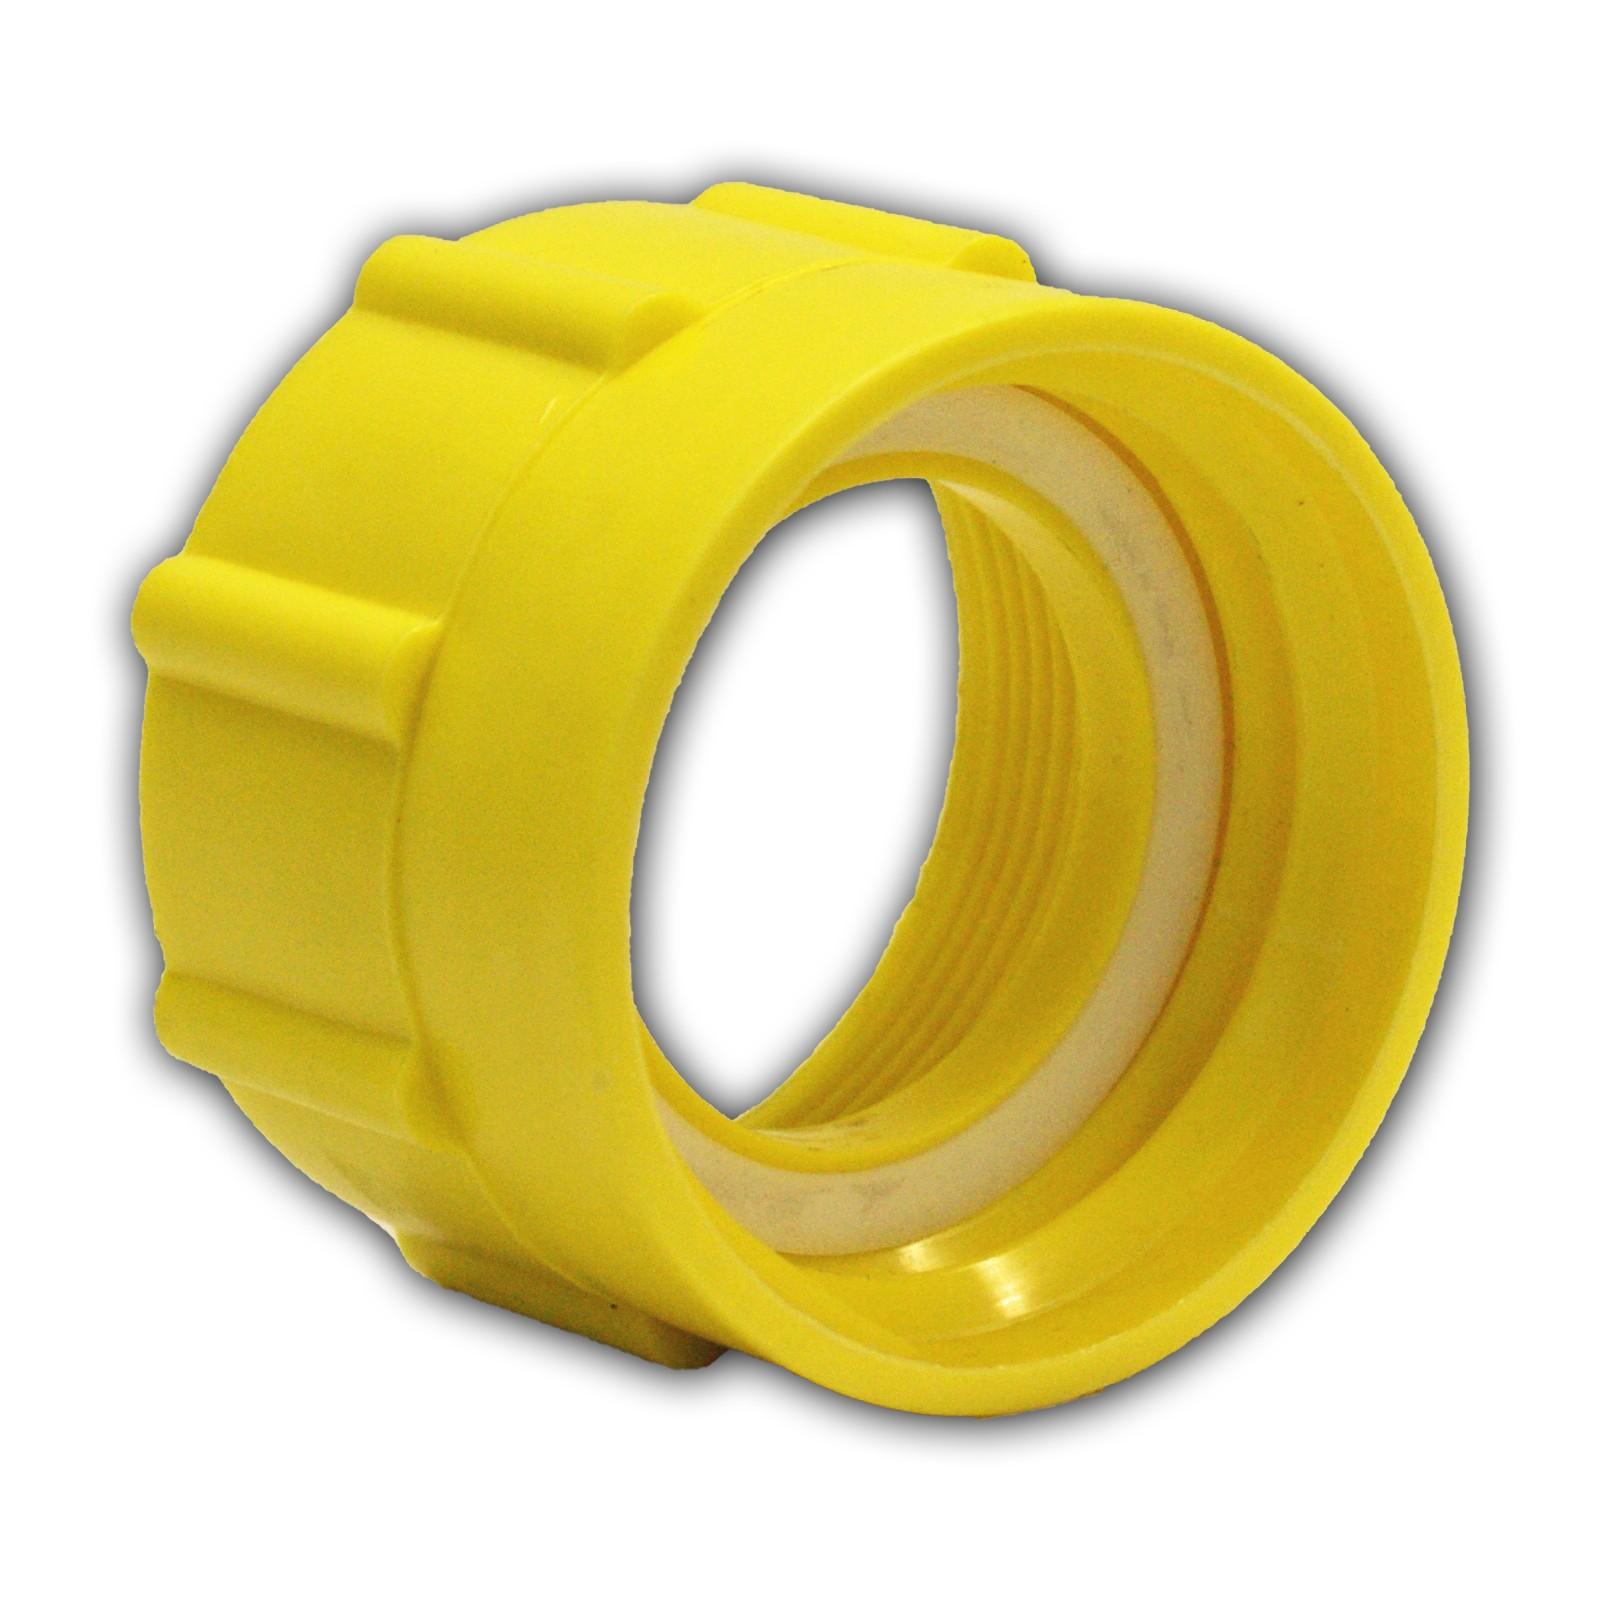 "IBC Kunststoff Adapter Kappe S60x6 1/"" 3//4 Zoll Innengewinde Schraubkappe Deckel"